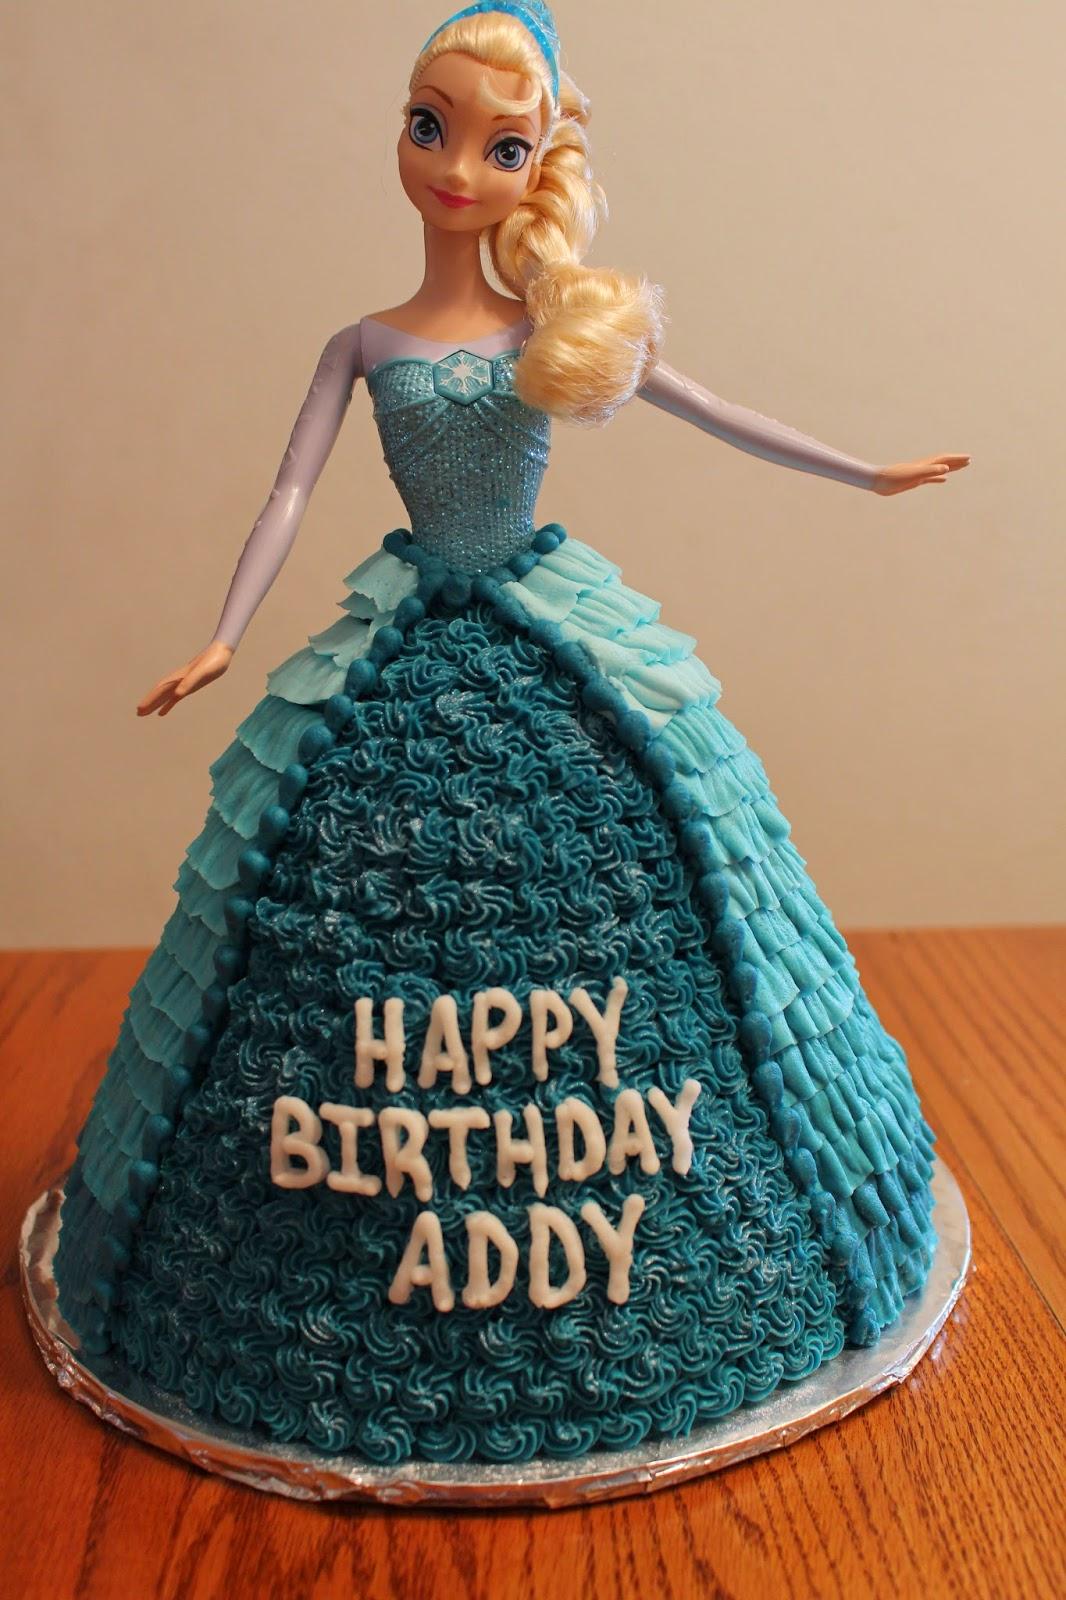 Elsa Doll Cake Images : The McClanahan 7: Elsa Doll Cake #frozencake